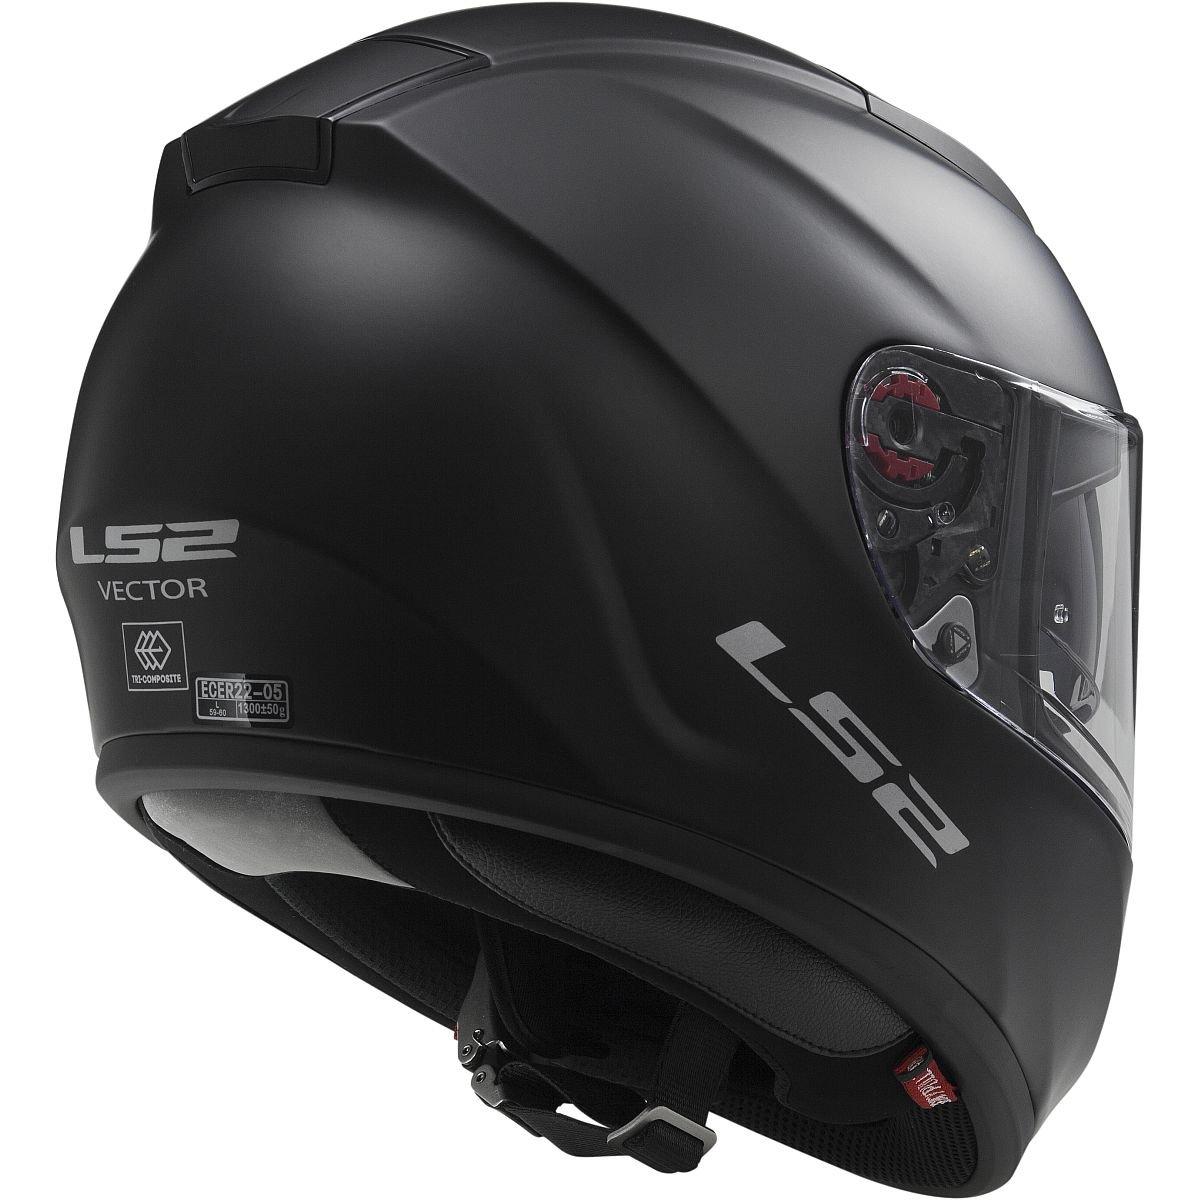 30d45099 Amazon.com: LS2 Helmets Vector Solid Full Face Motorcycle Helmet with  Sunshield (Matte Black, Small): Automotive